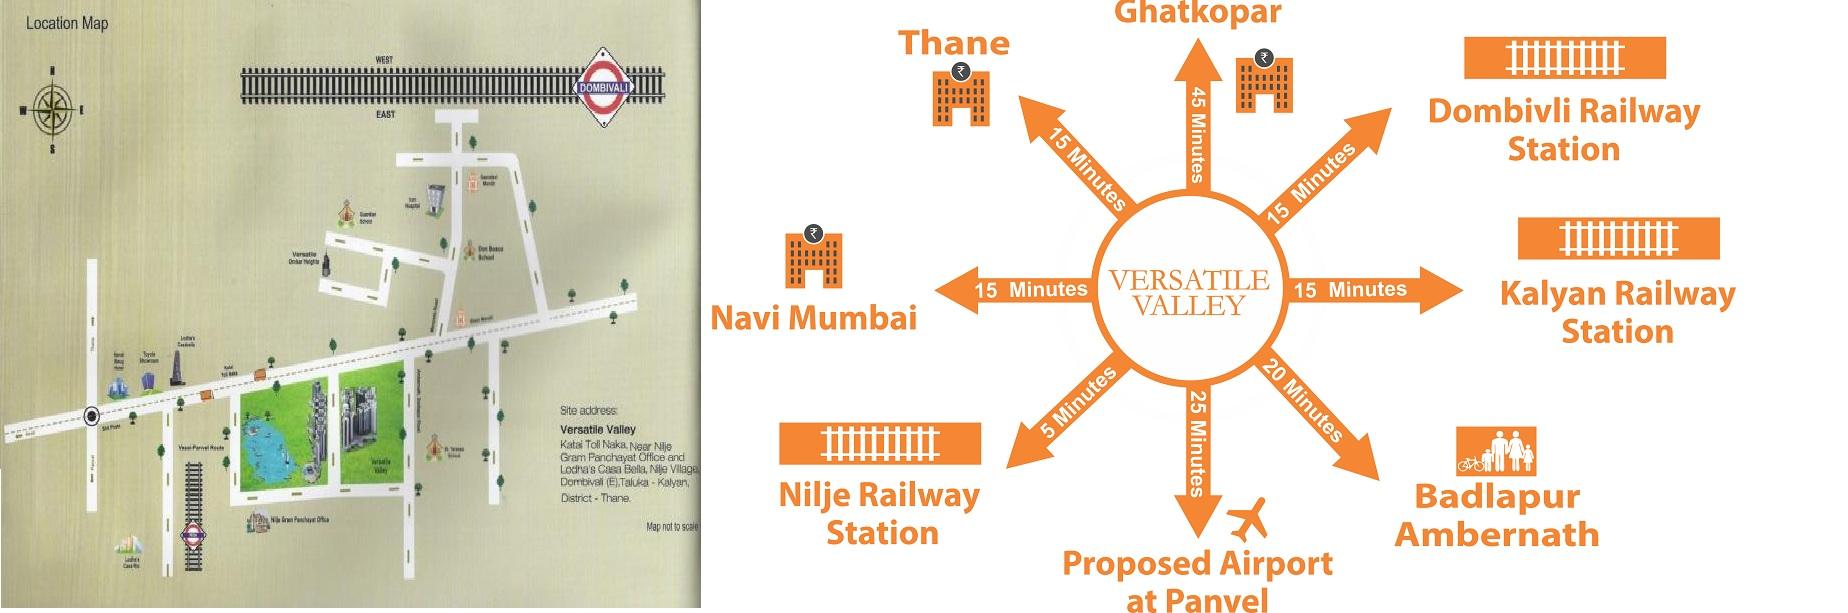 versatile valley location image5